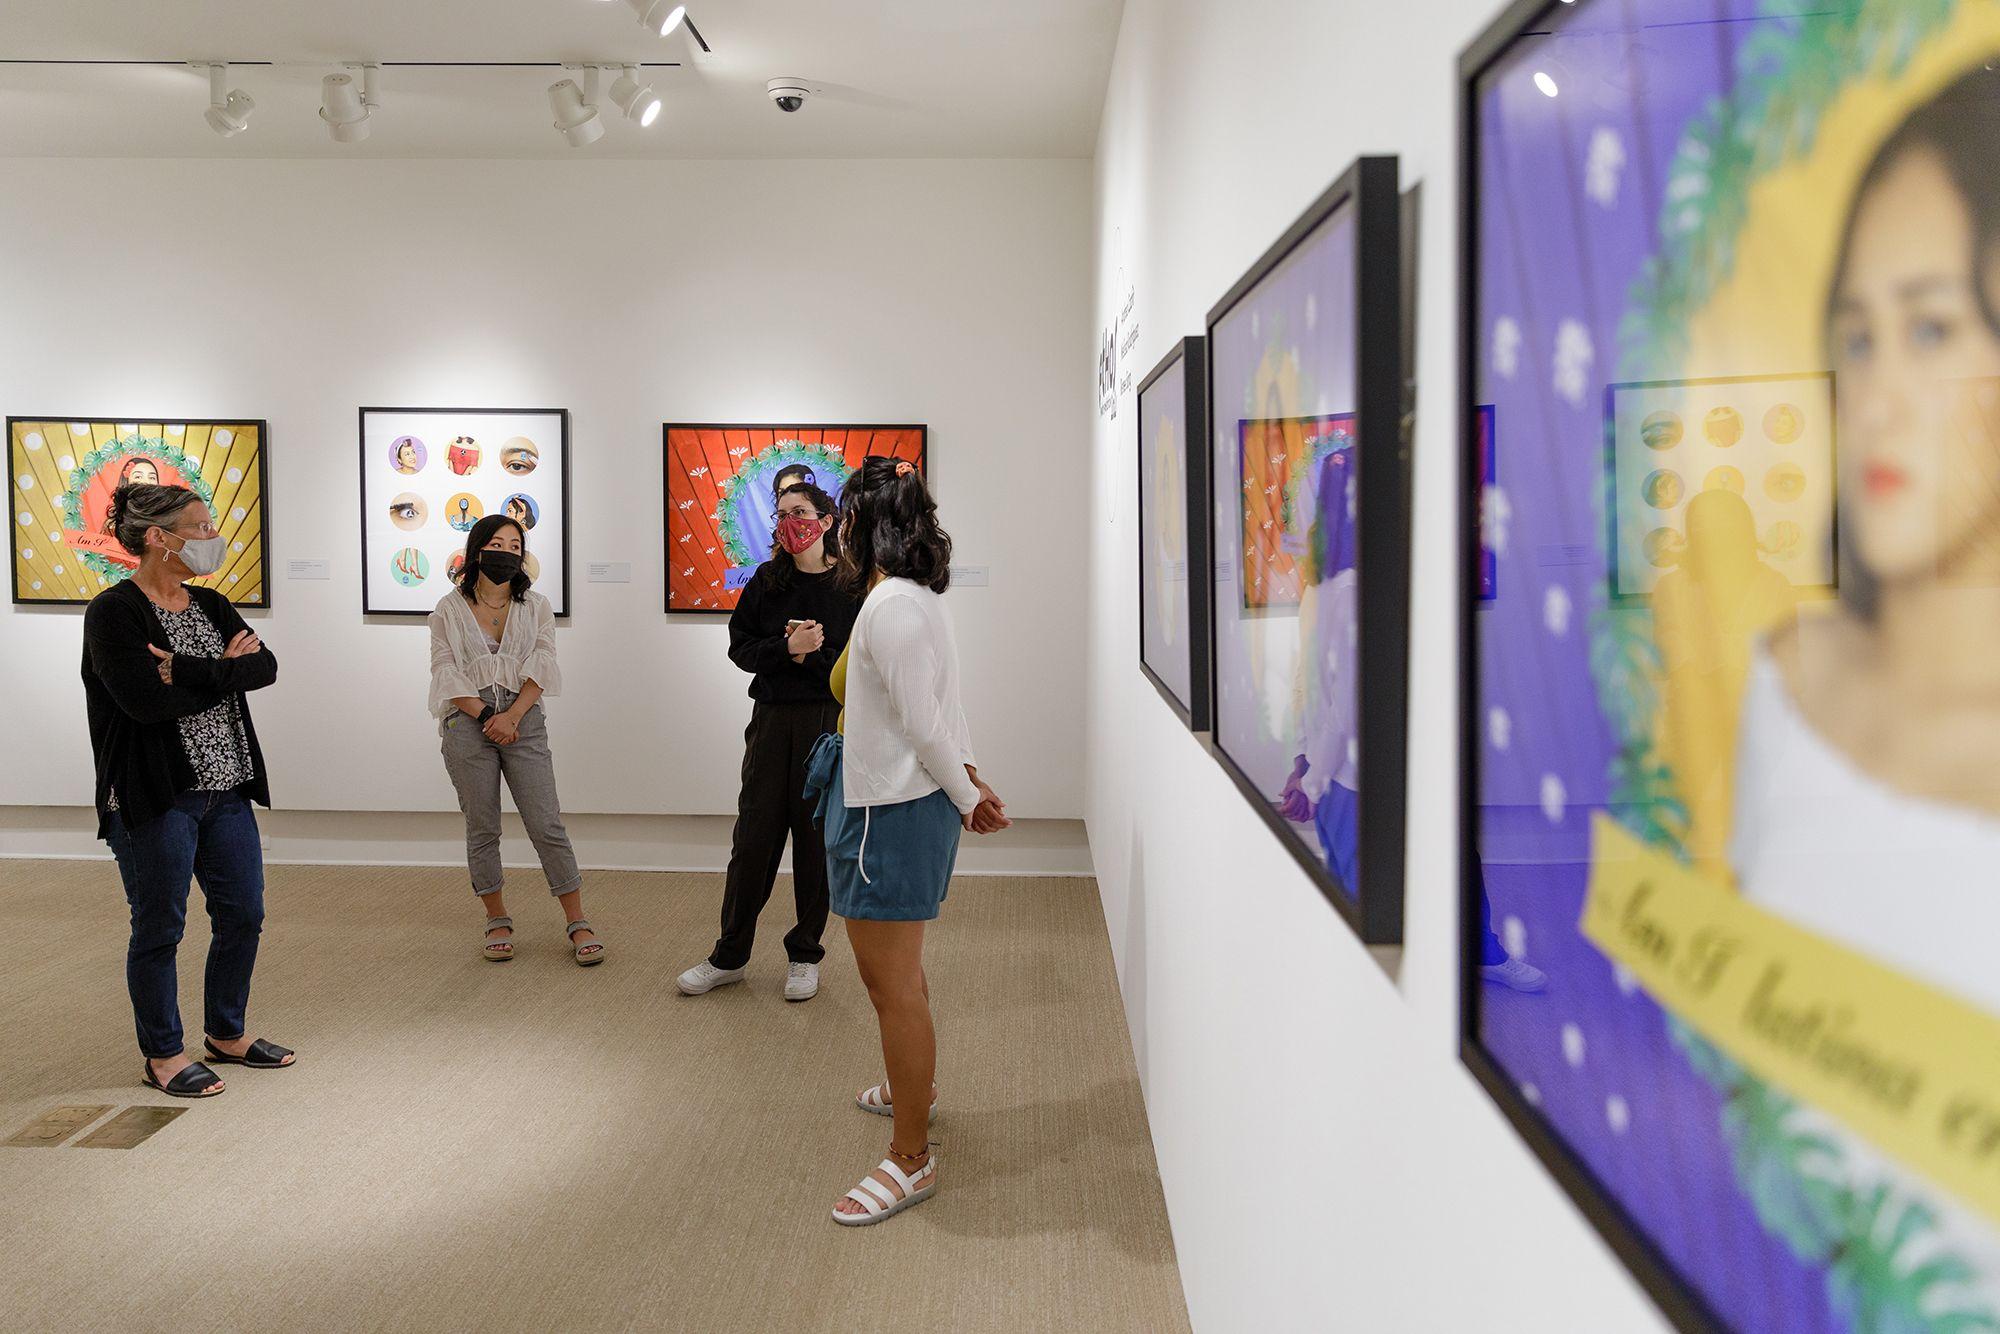 Art professor Dawn Roe and studio art seniors discussing their original art exhibition at the Cornell Fine Arts Museum.